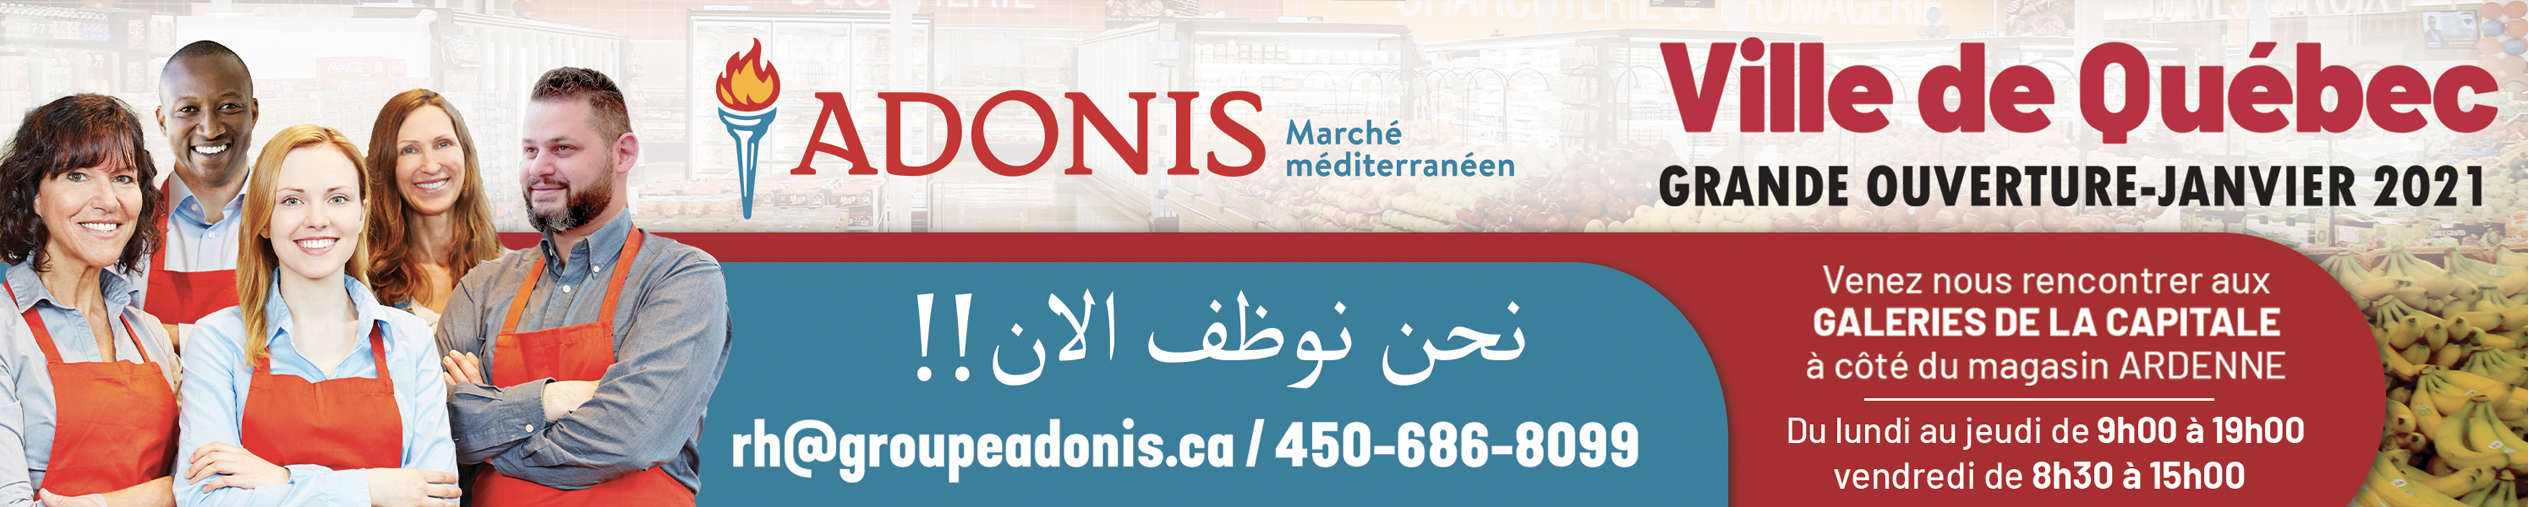 اعلان مطعم ادونيس